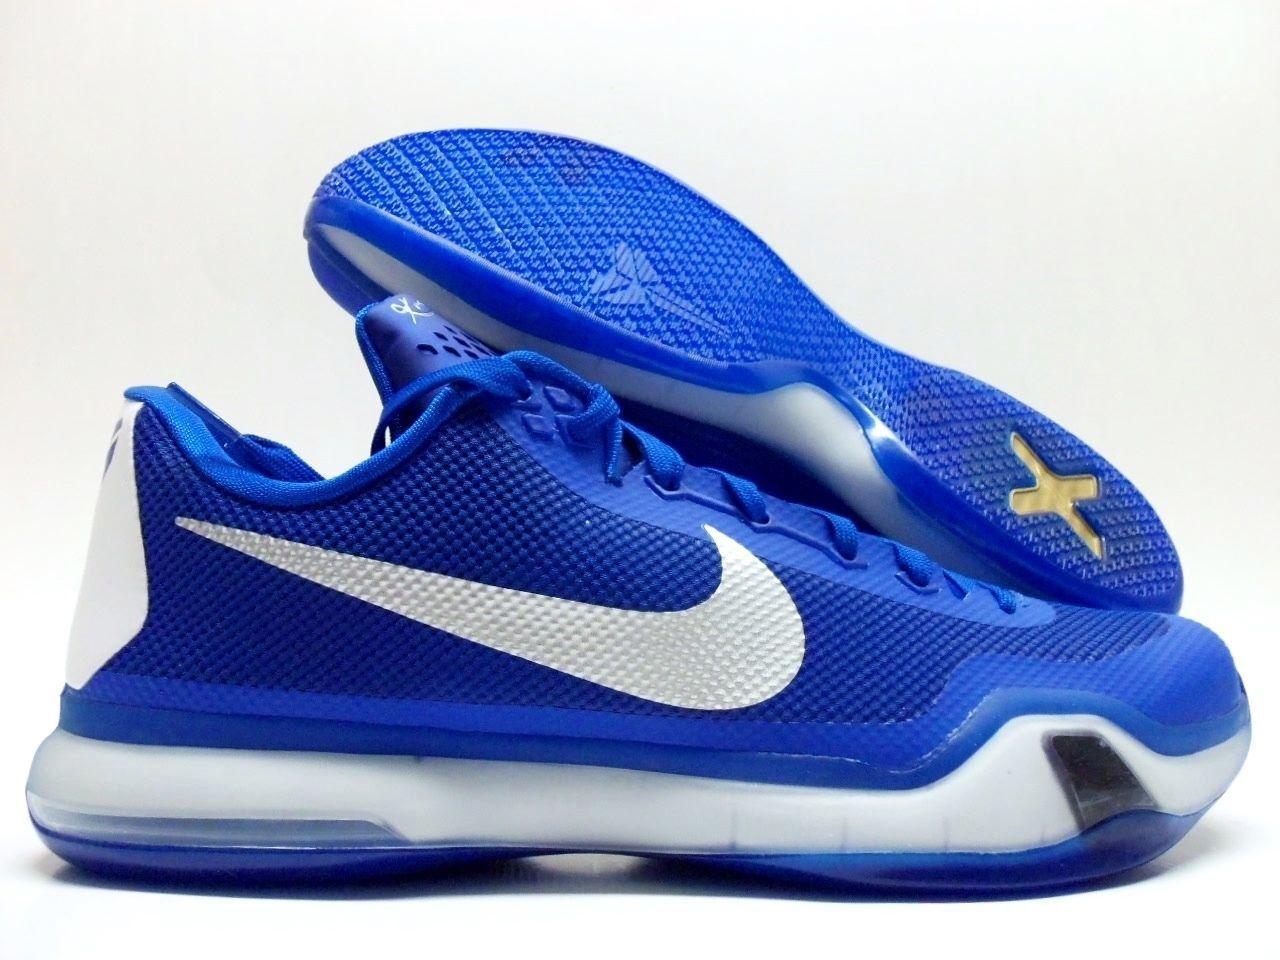 NEW Nike Kobe X 10 Tb 813030 Silver 402 Game Royal Metallic Silver 813030 White Mens 16.5 ANB 753f08